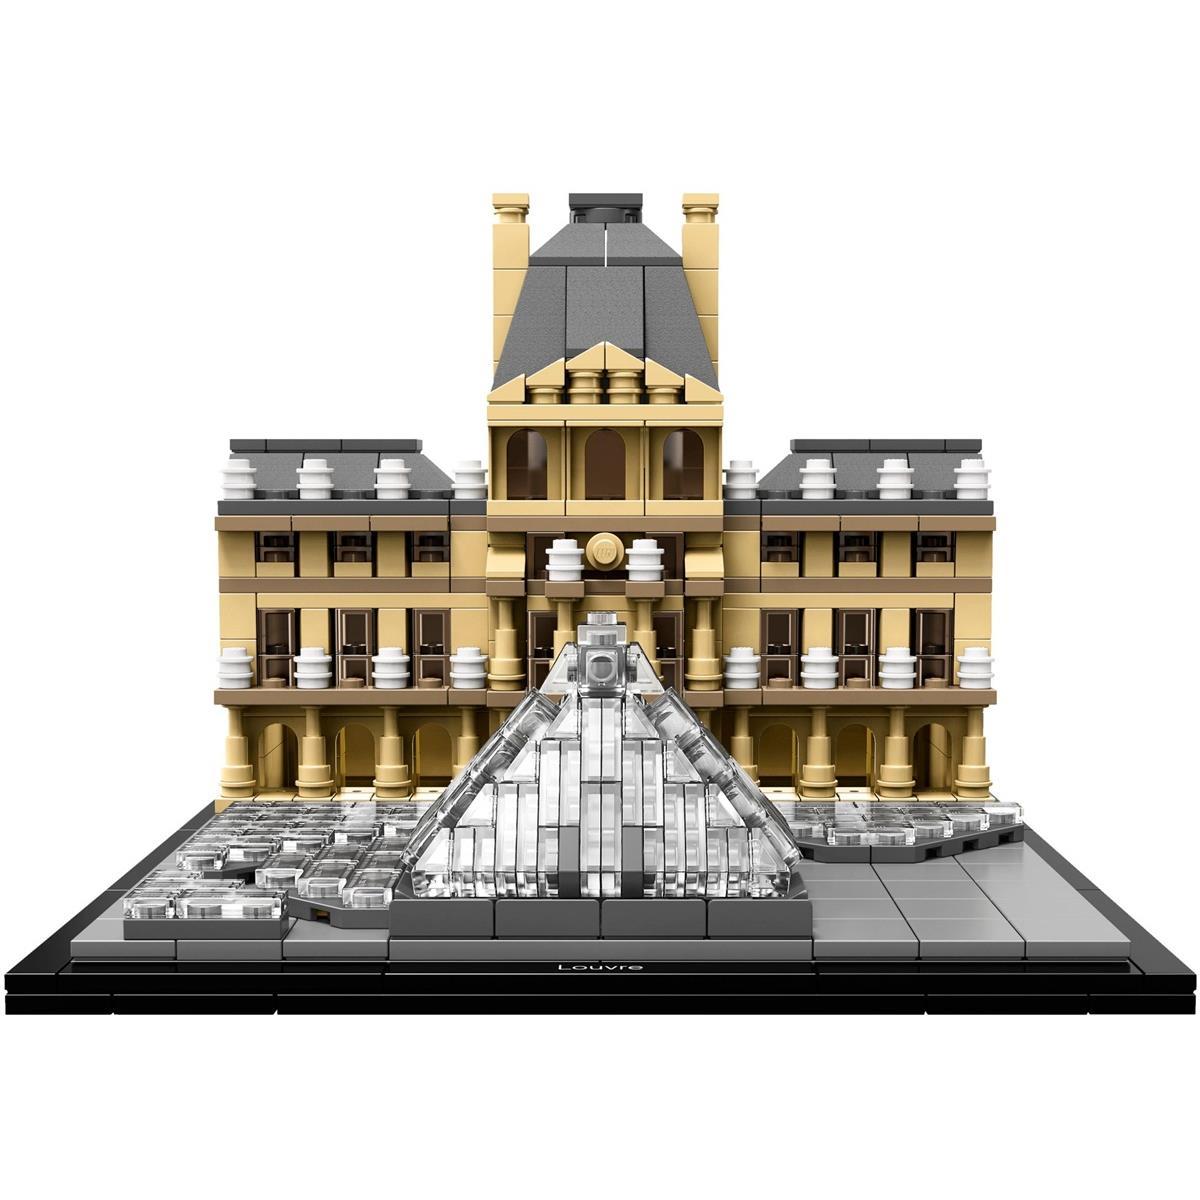 21024 LEGO Architecture Louvre